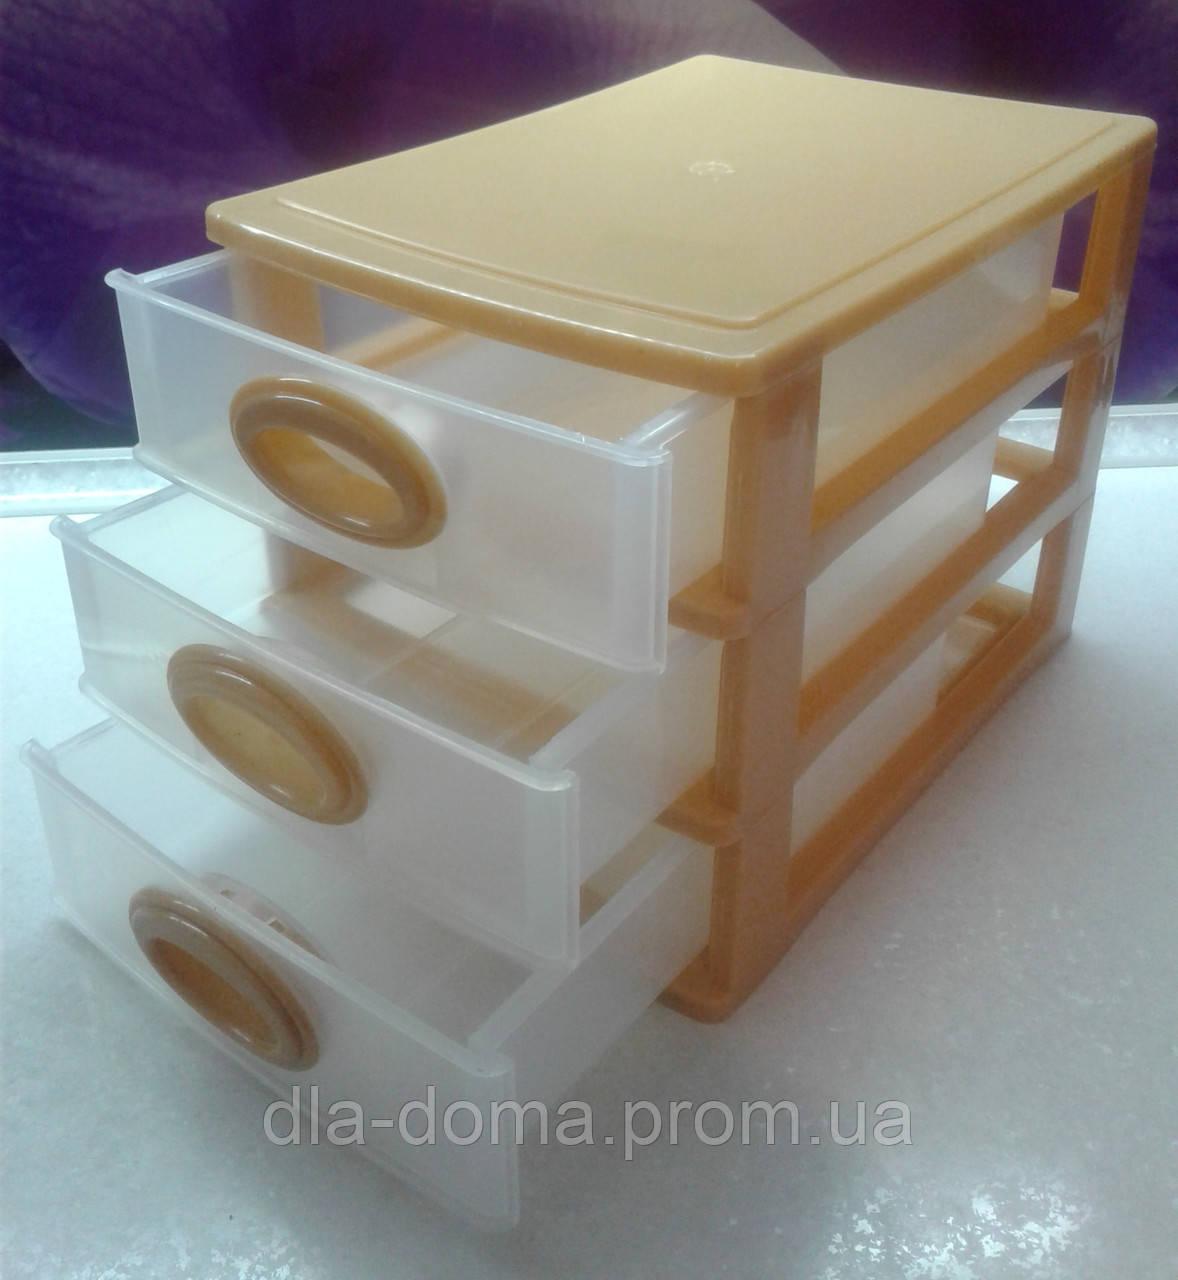 Мини комод на 3 ящика желтый, фото 1